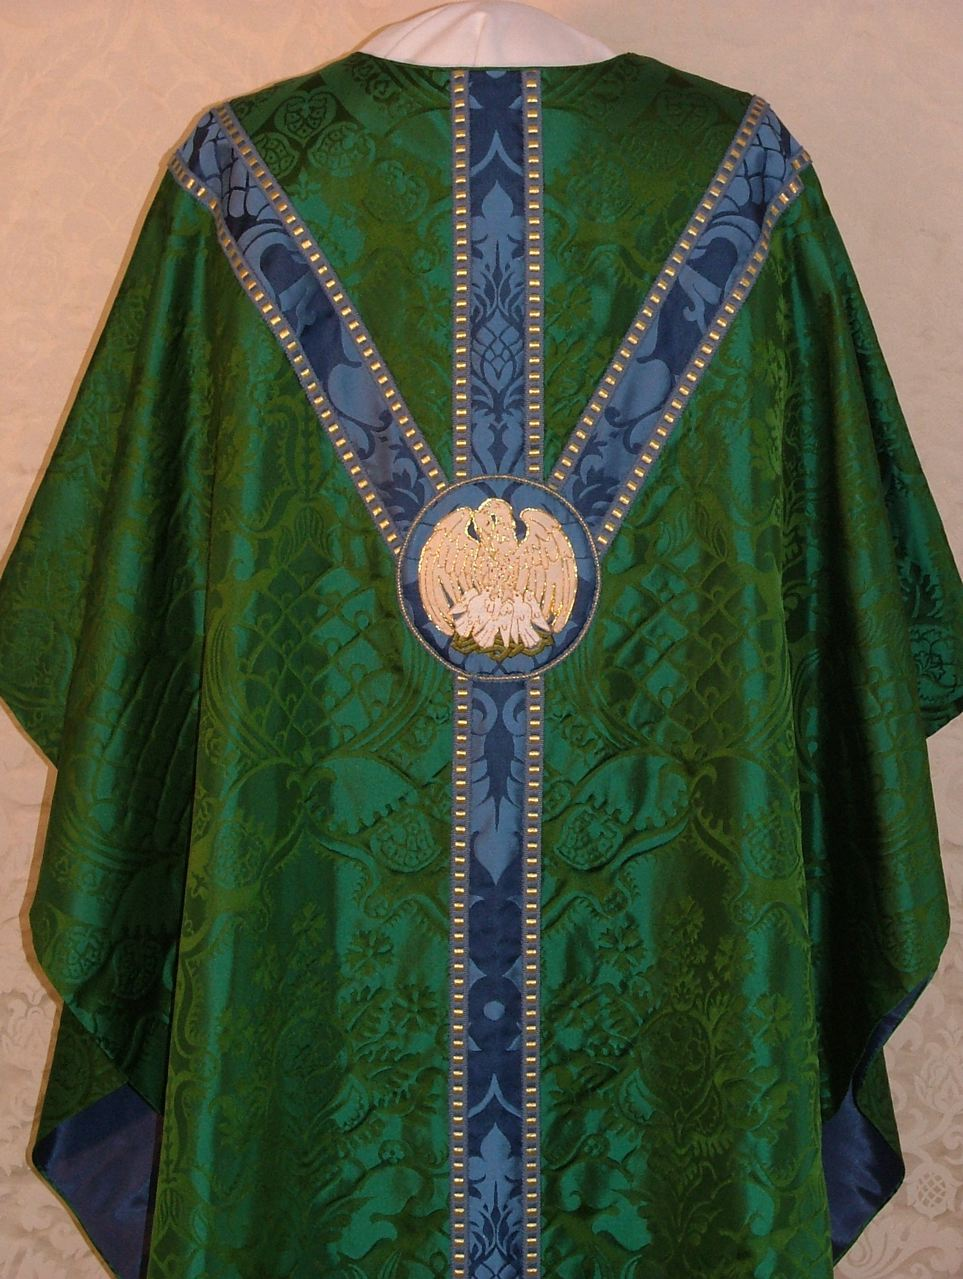 Priest Vestments, Liturgical Apparel   The Catholic Company